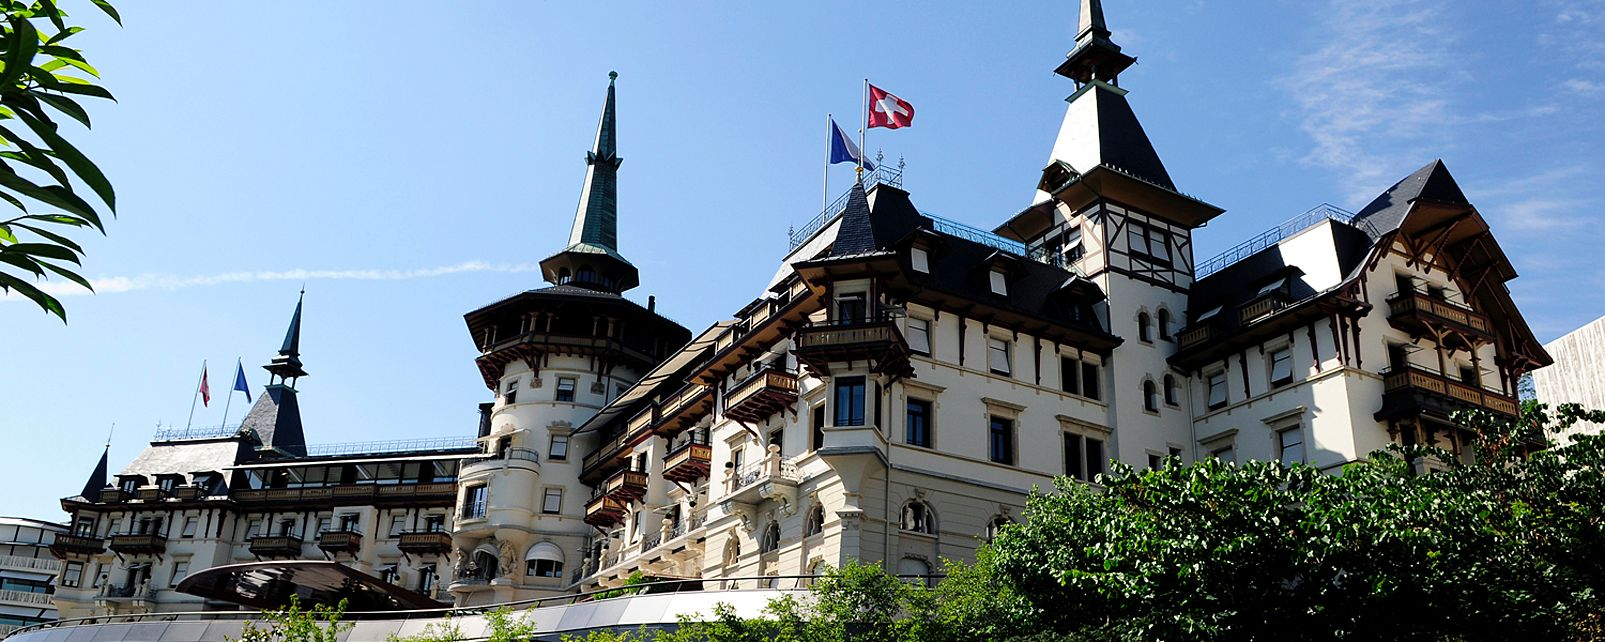 Hotel The Dolder Grand